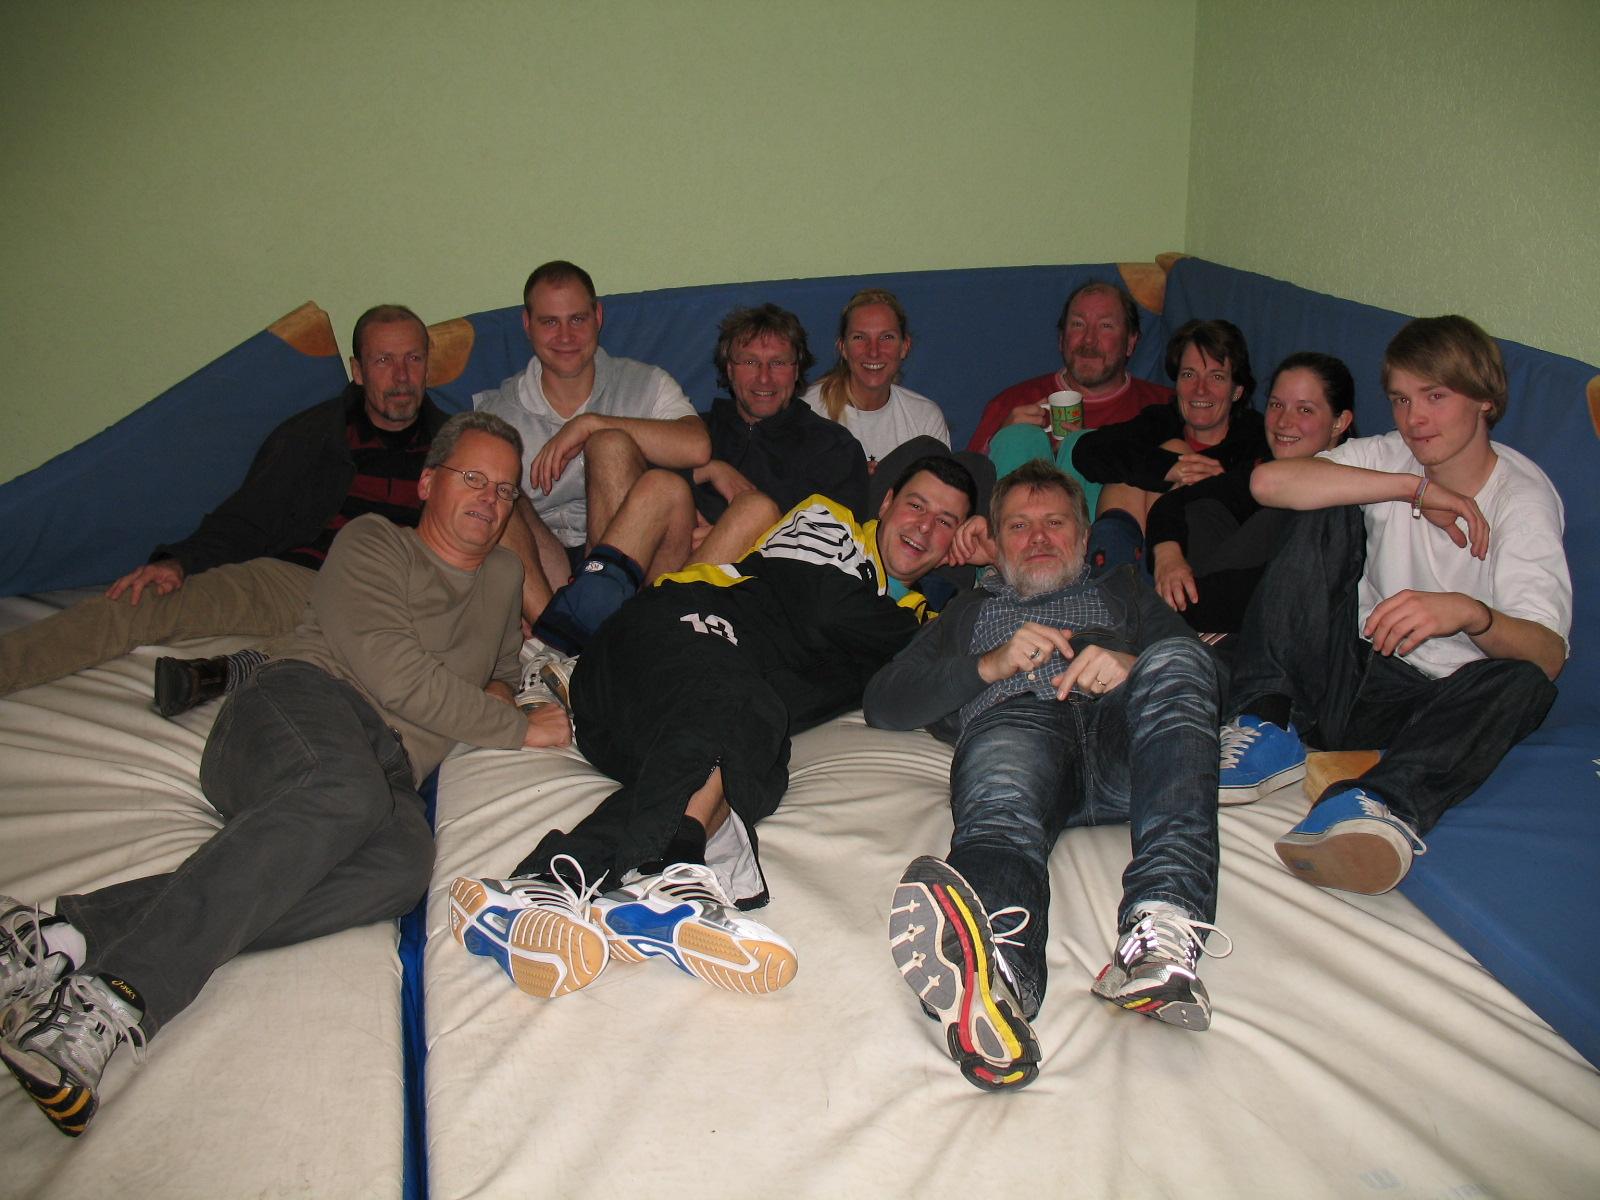 2009 Turnier Oerlenbach